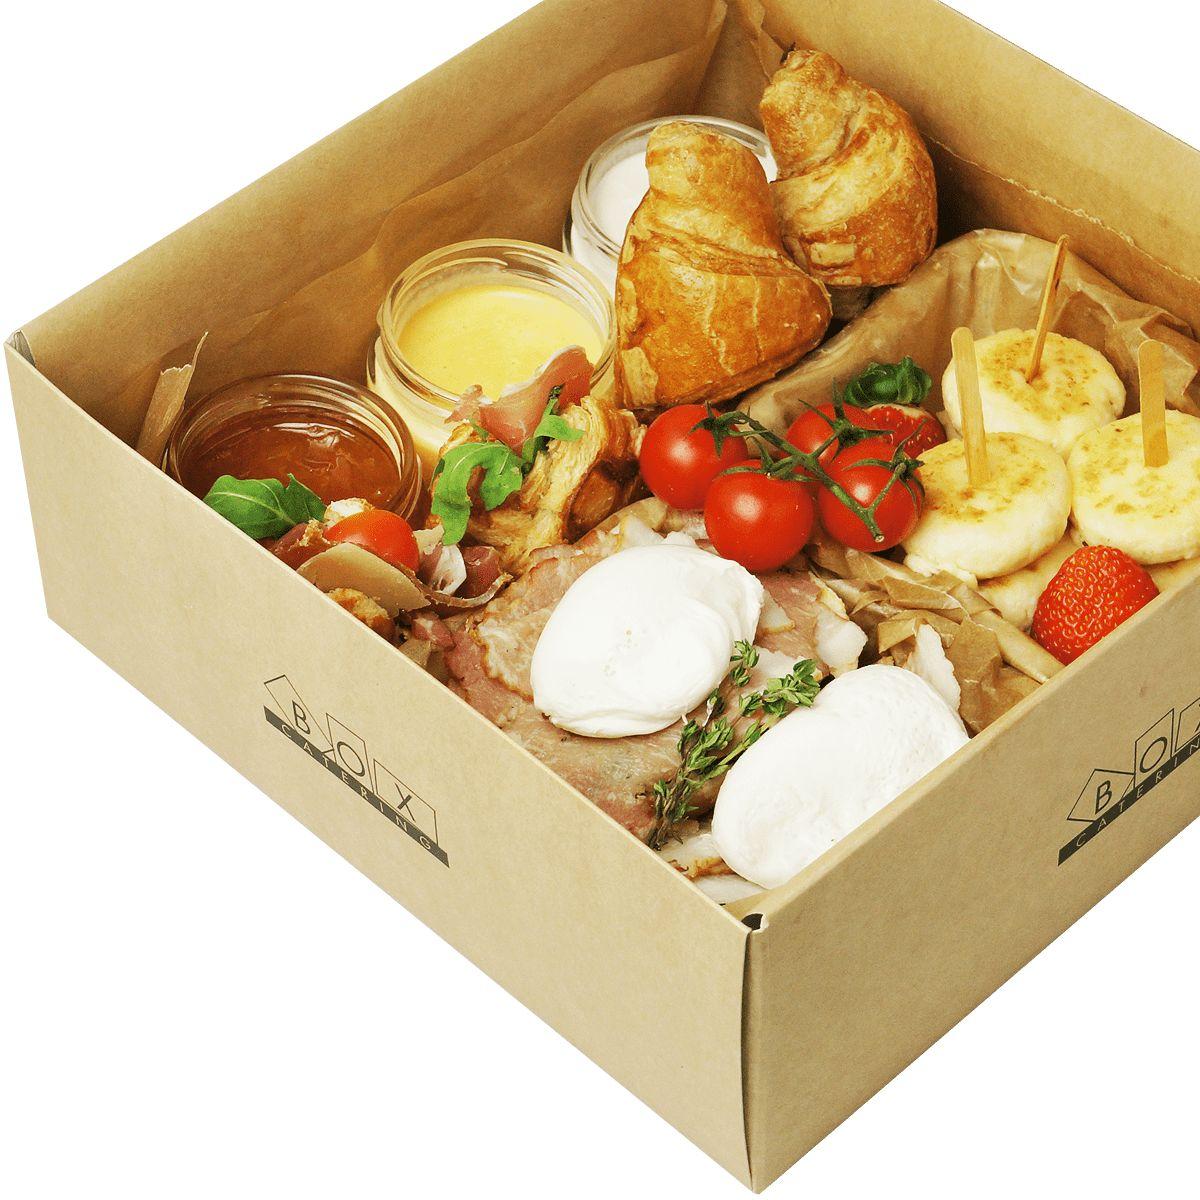 Breakfast бекон smart box фото 3